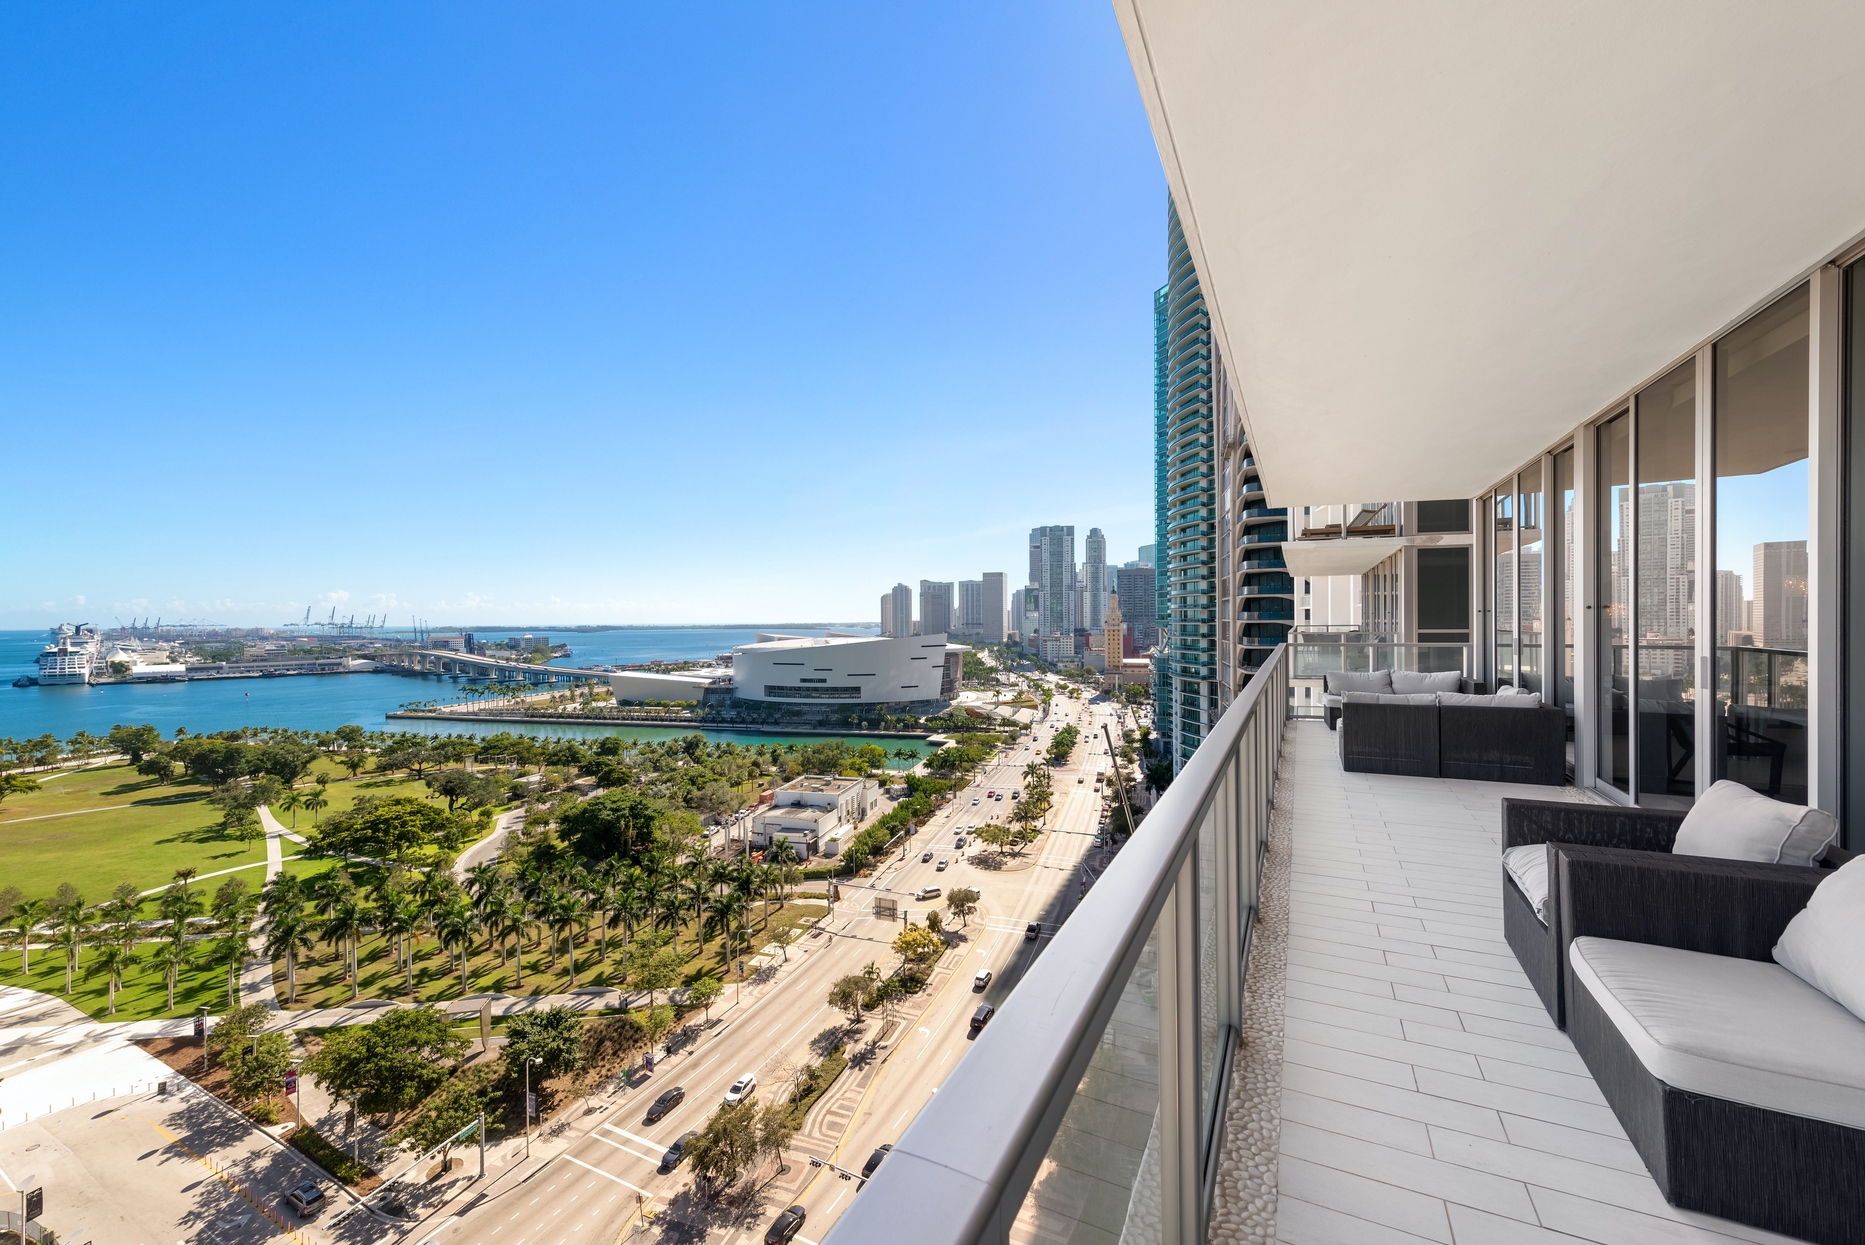 326-square-foot balcony